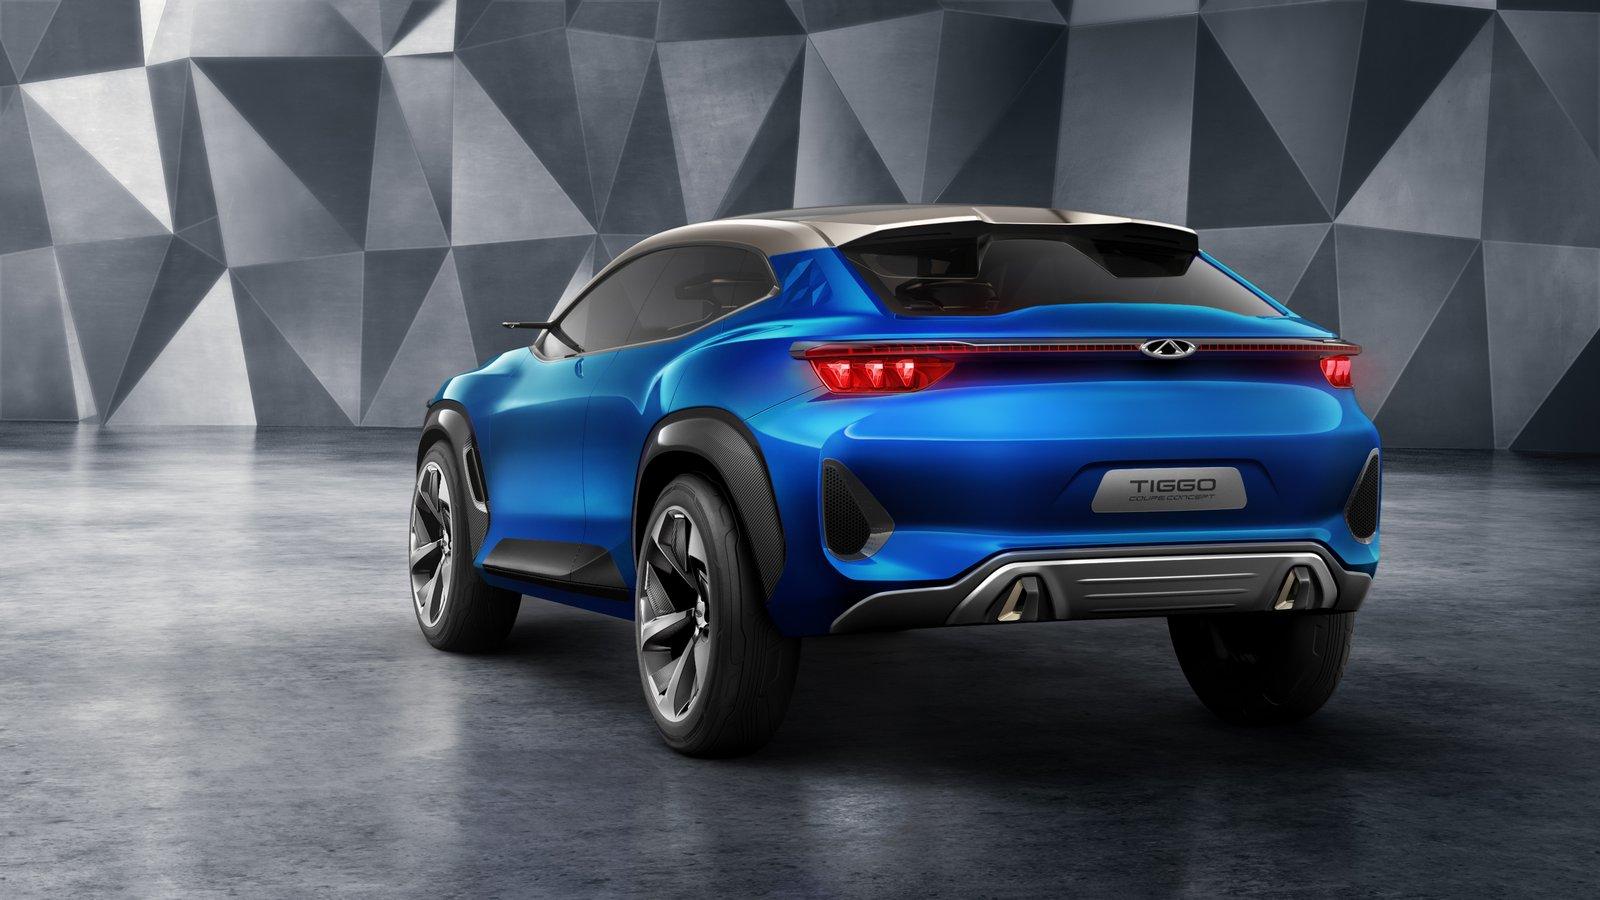 Chery-Tiggo-Sport-Coupe-Concept-3